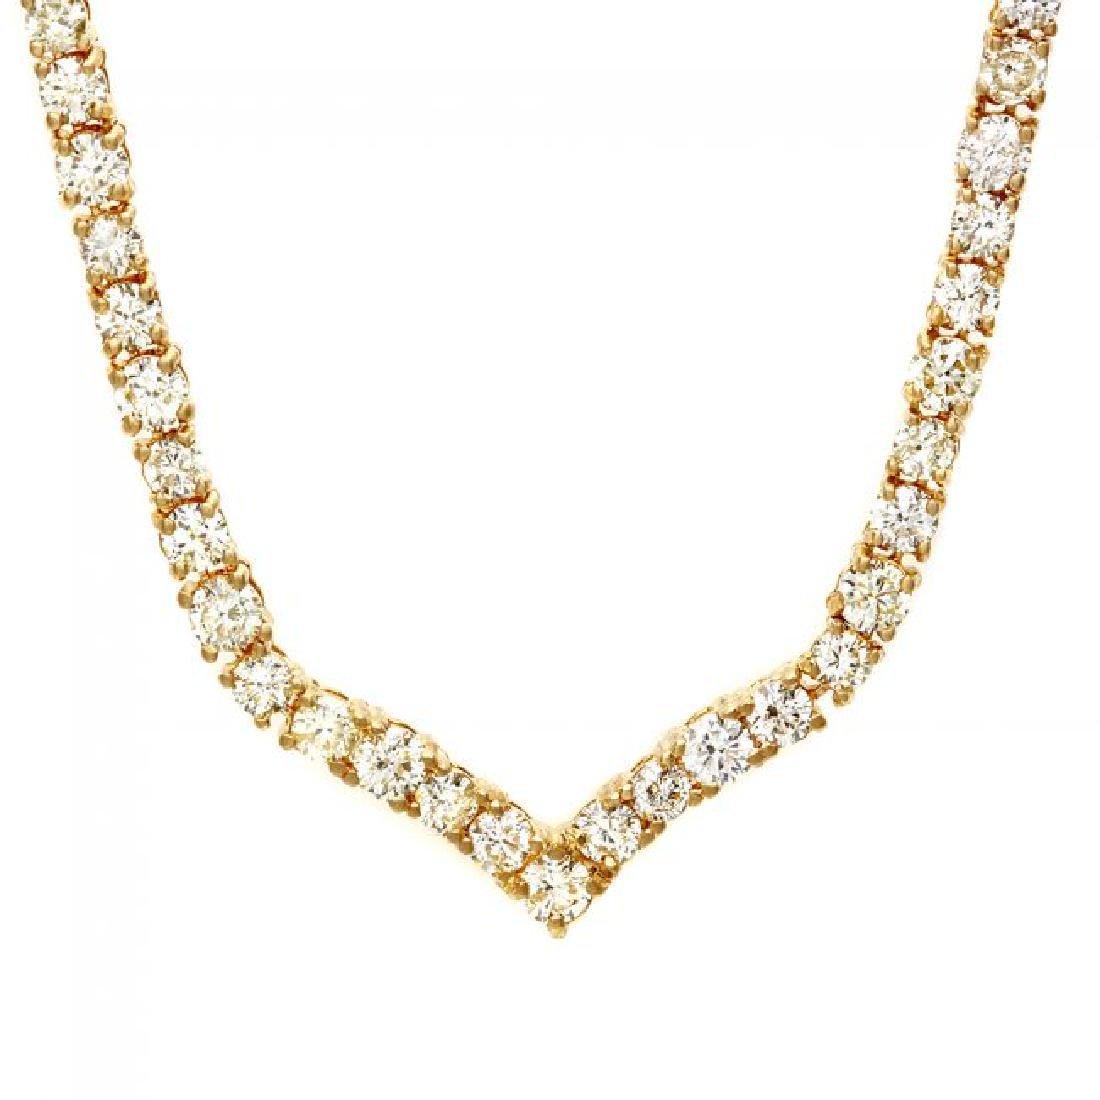 18k Yellow Gold 8.50ct Diamond Necklace - 6